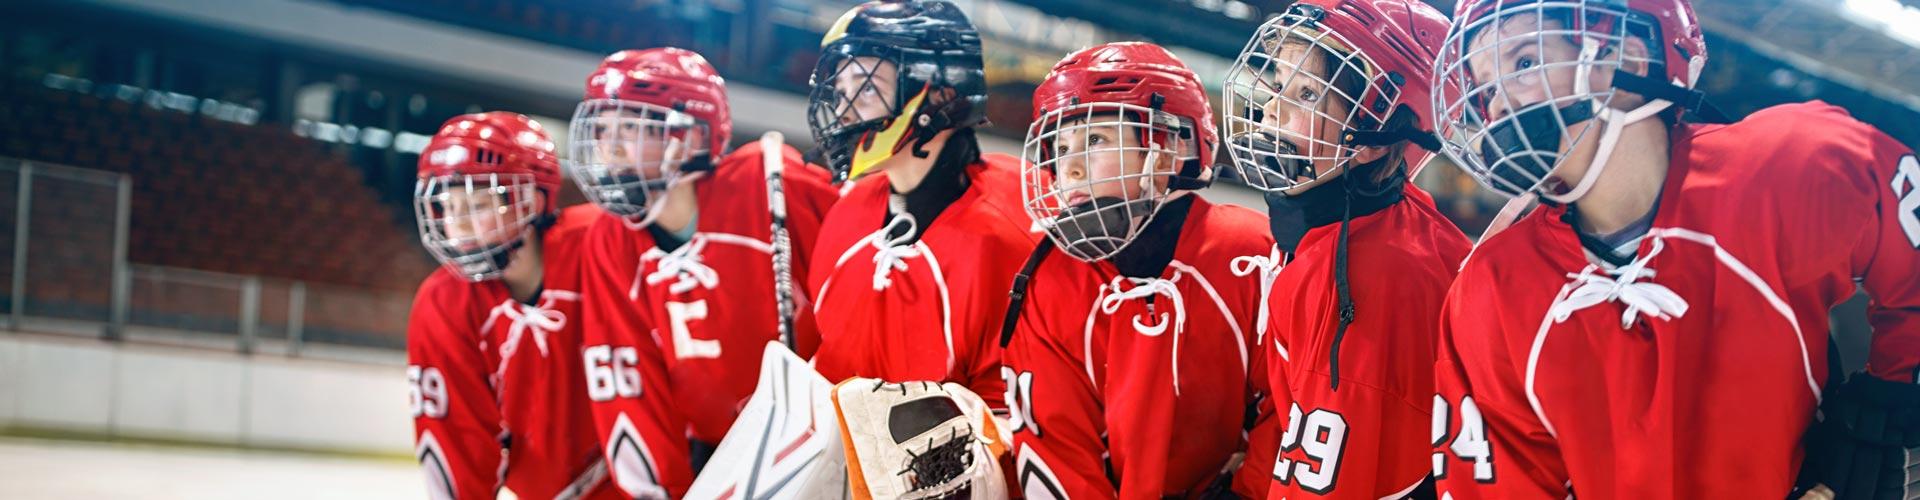 Young hockey team - children play ice hockey